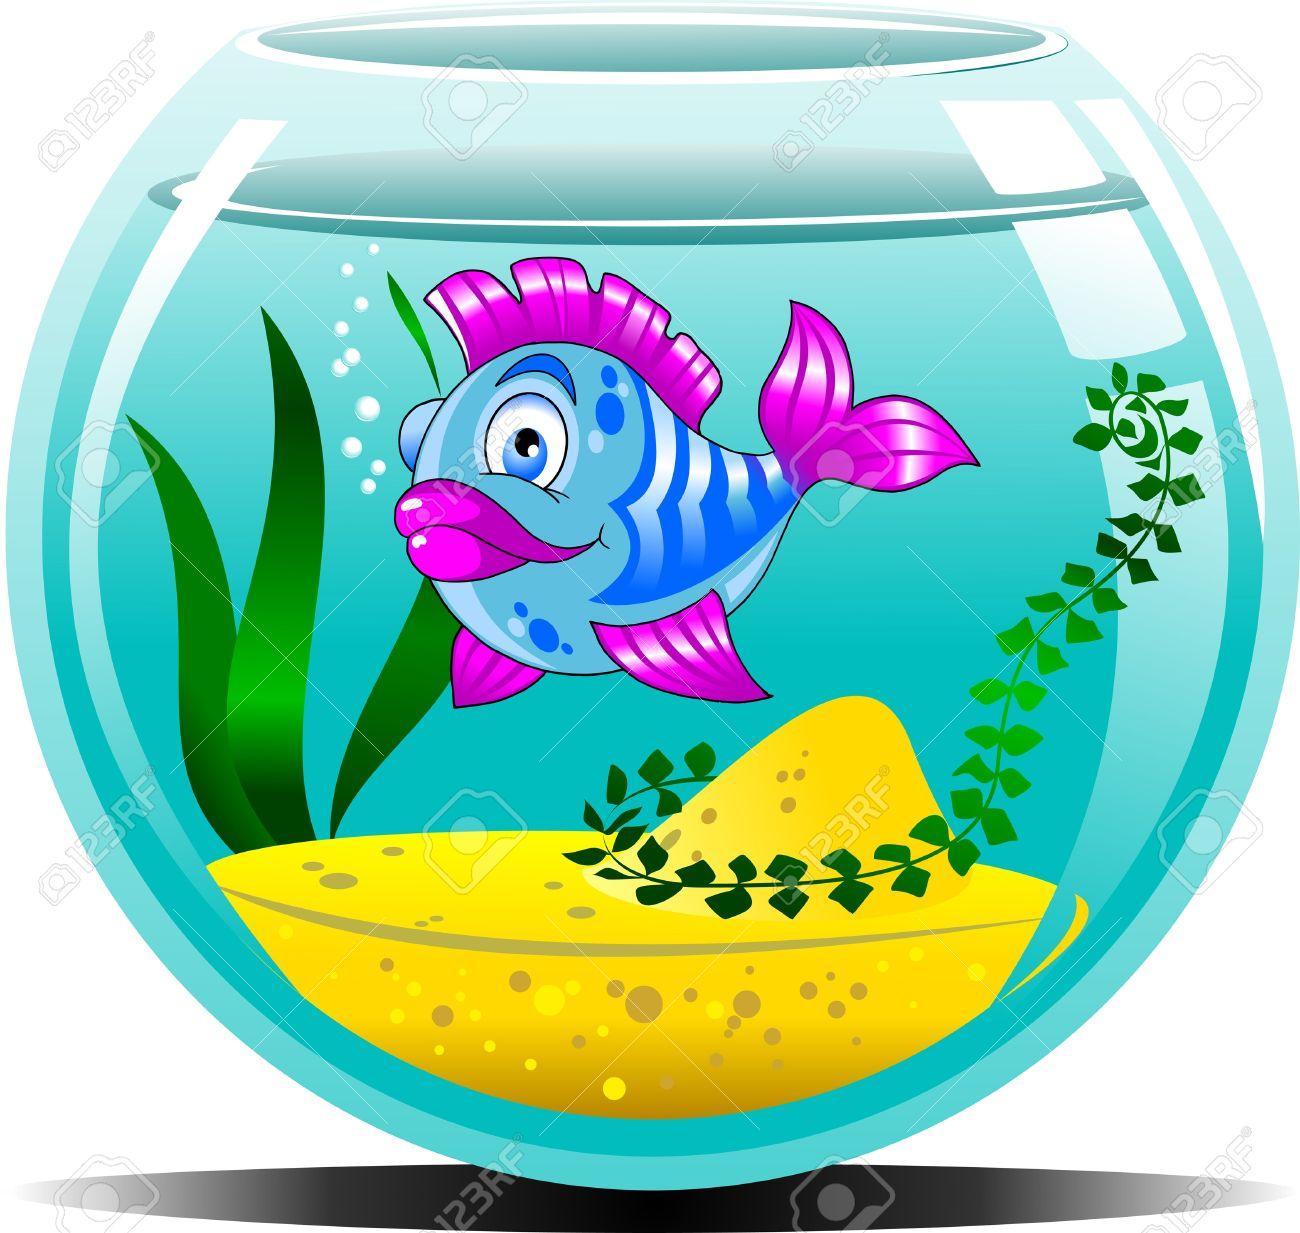 Fishtank clipart #11, Download drawings